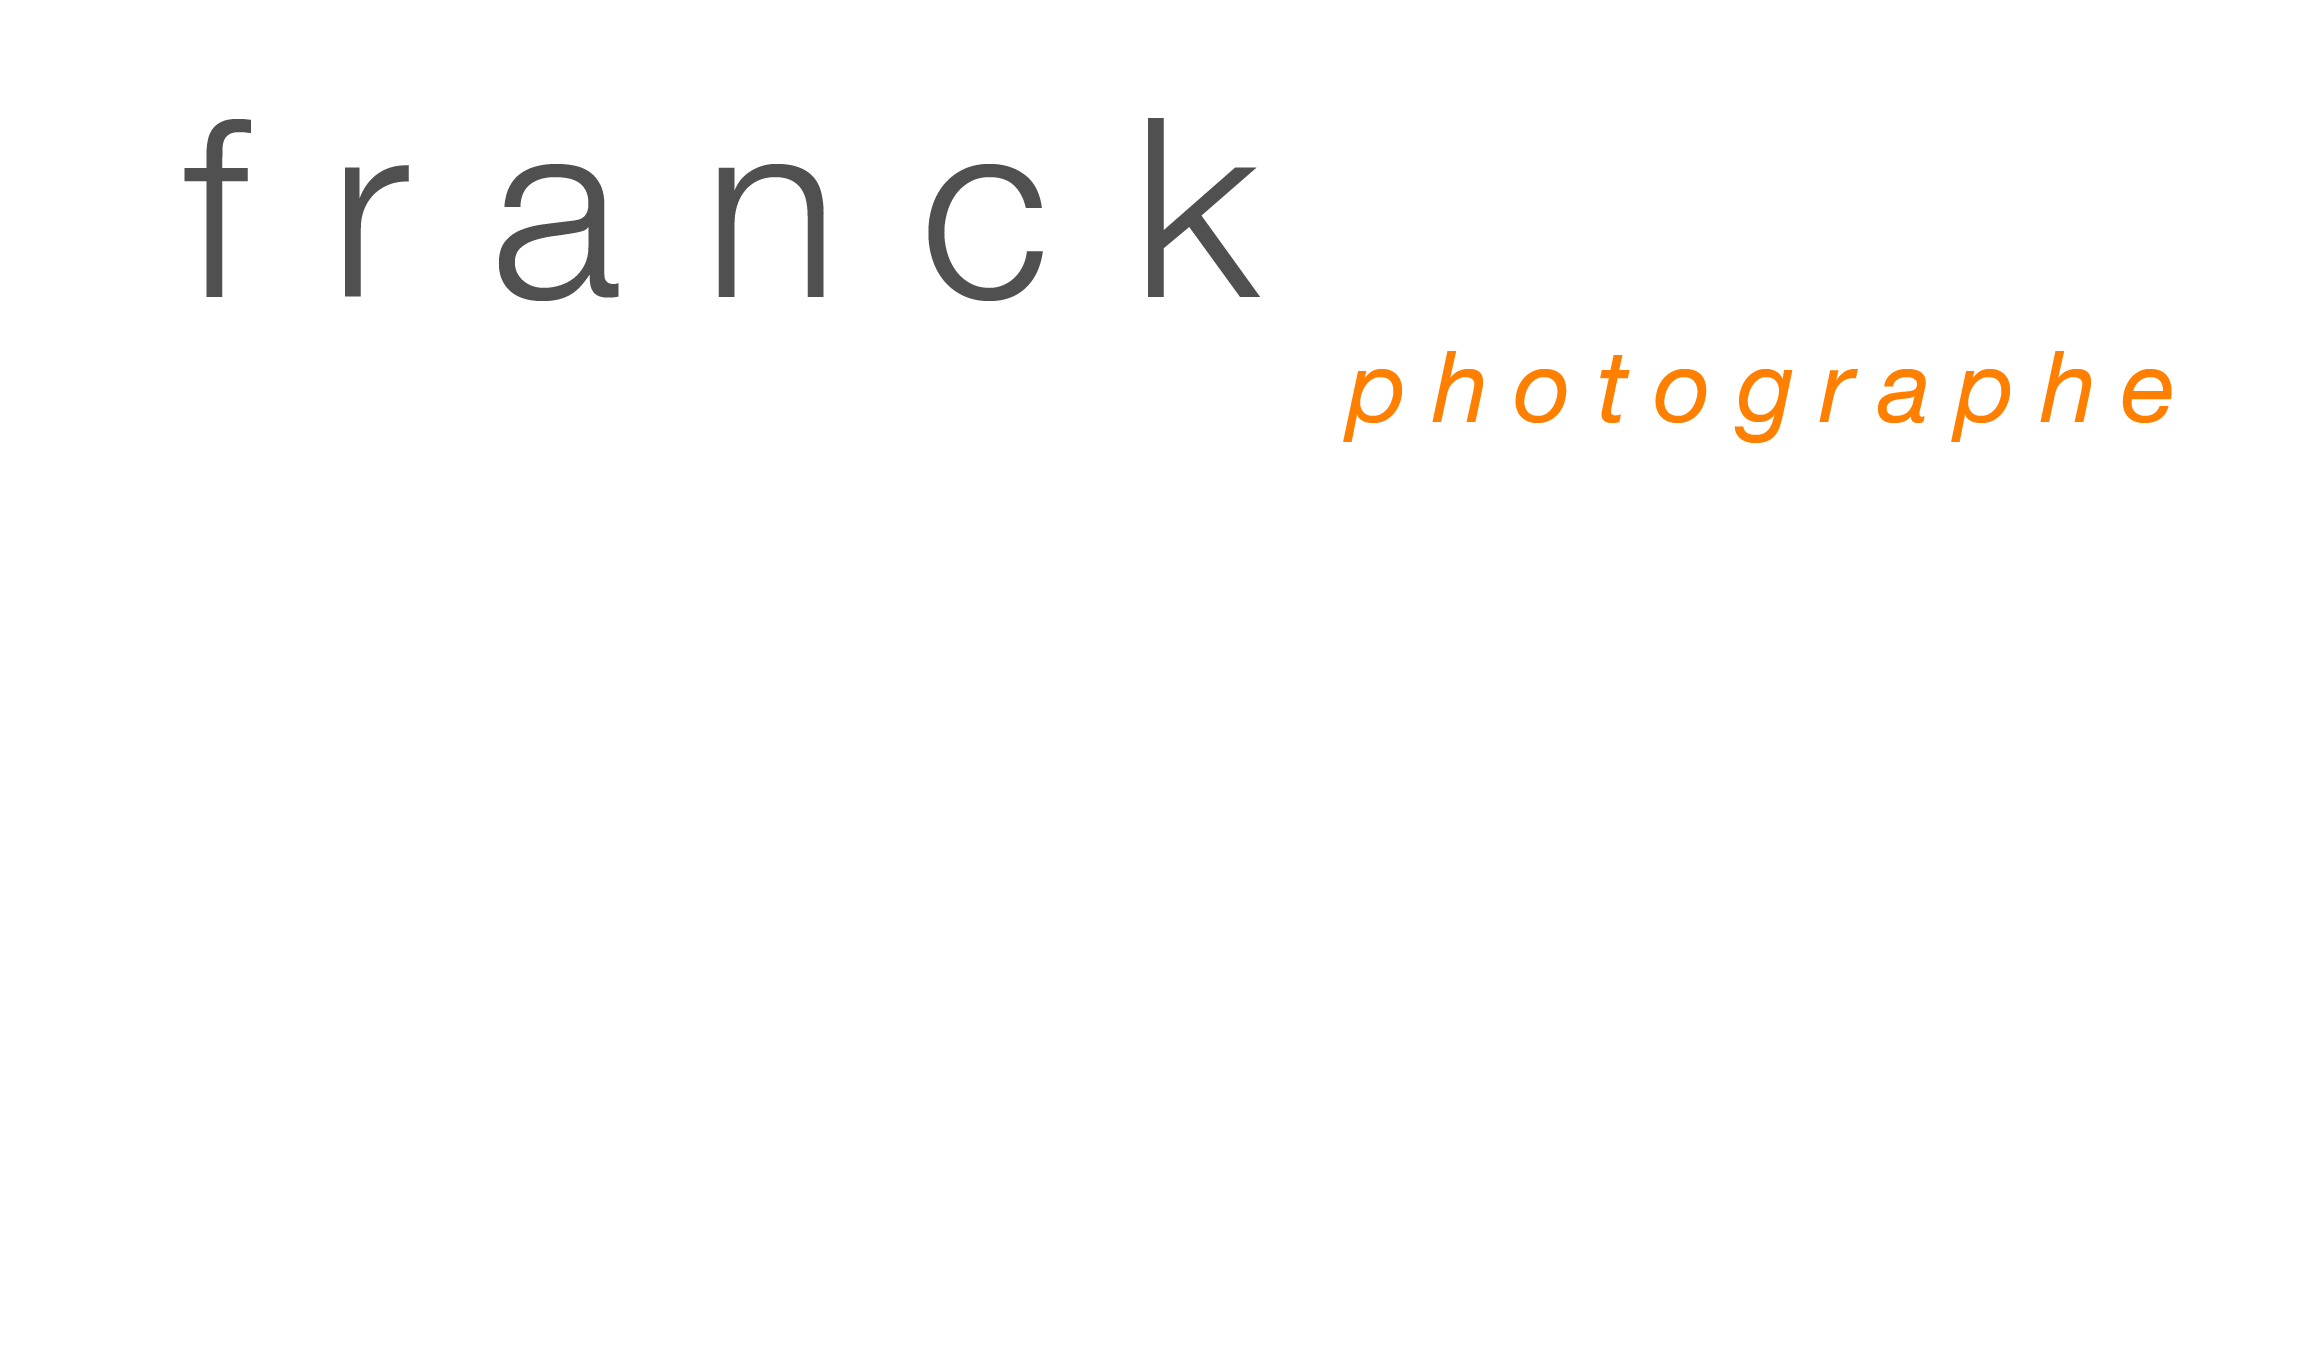 Franck KAUFF photographe